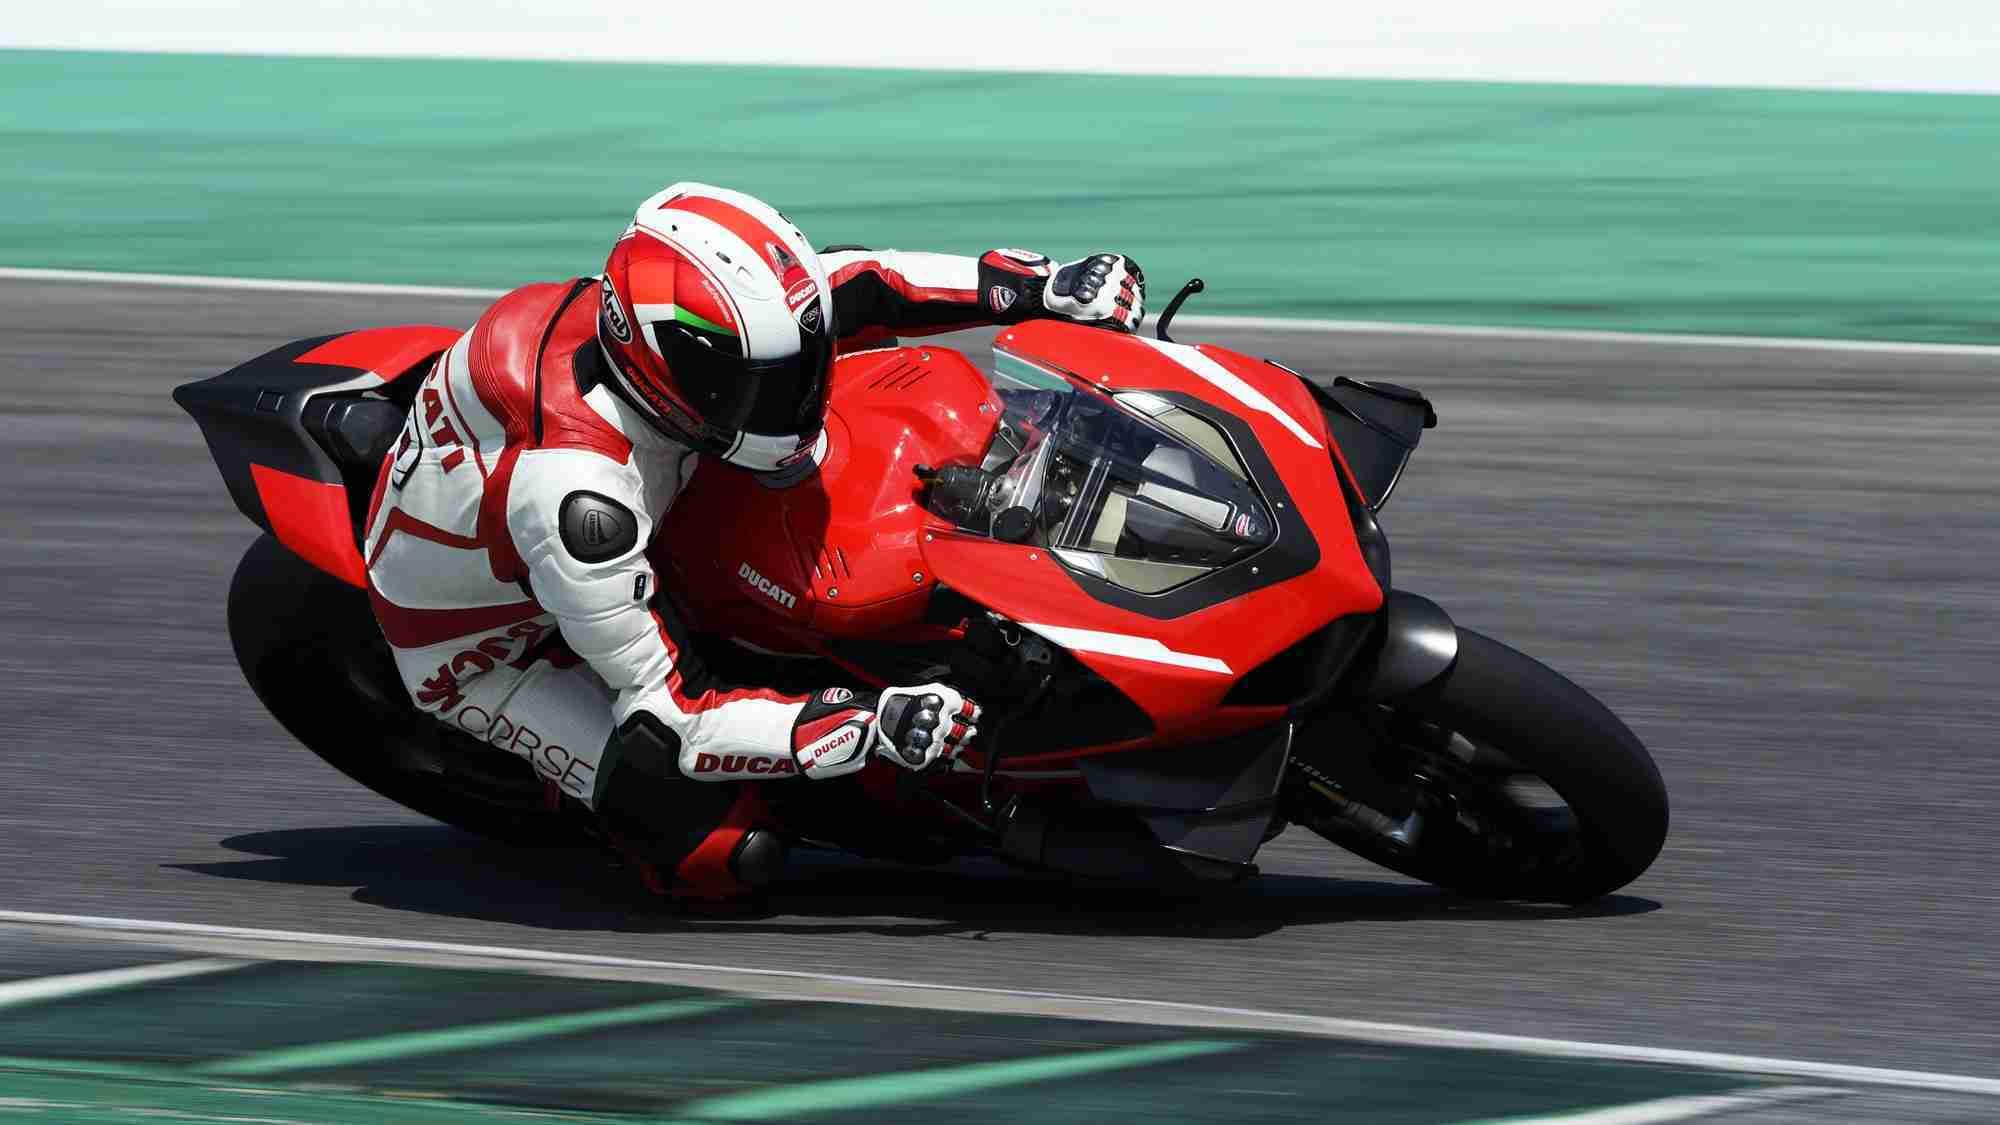 Claudio Domenicali riding the Ducati Superleggera V4